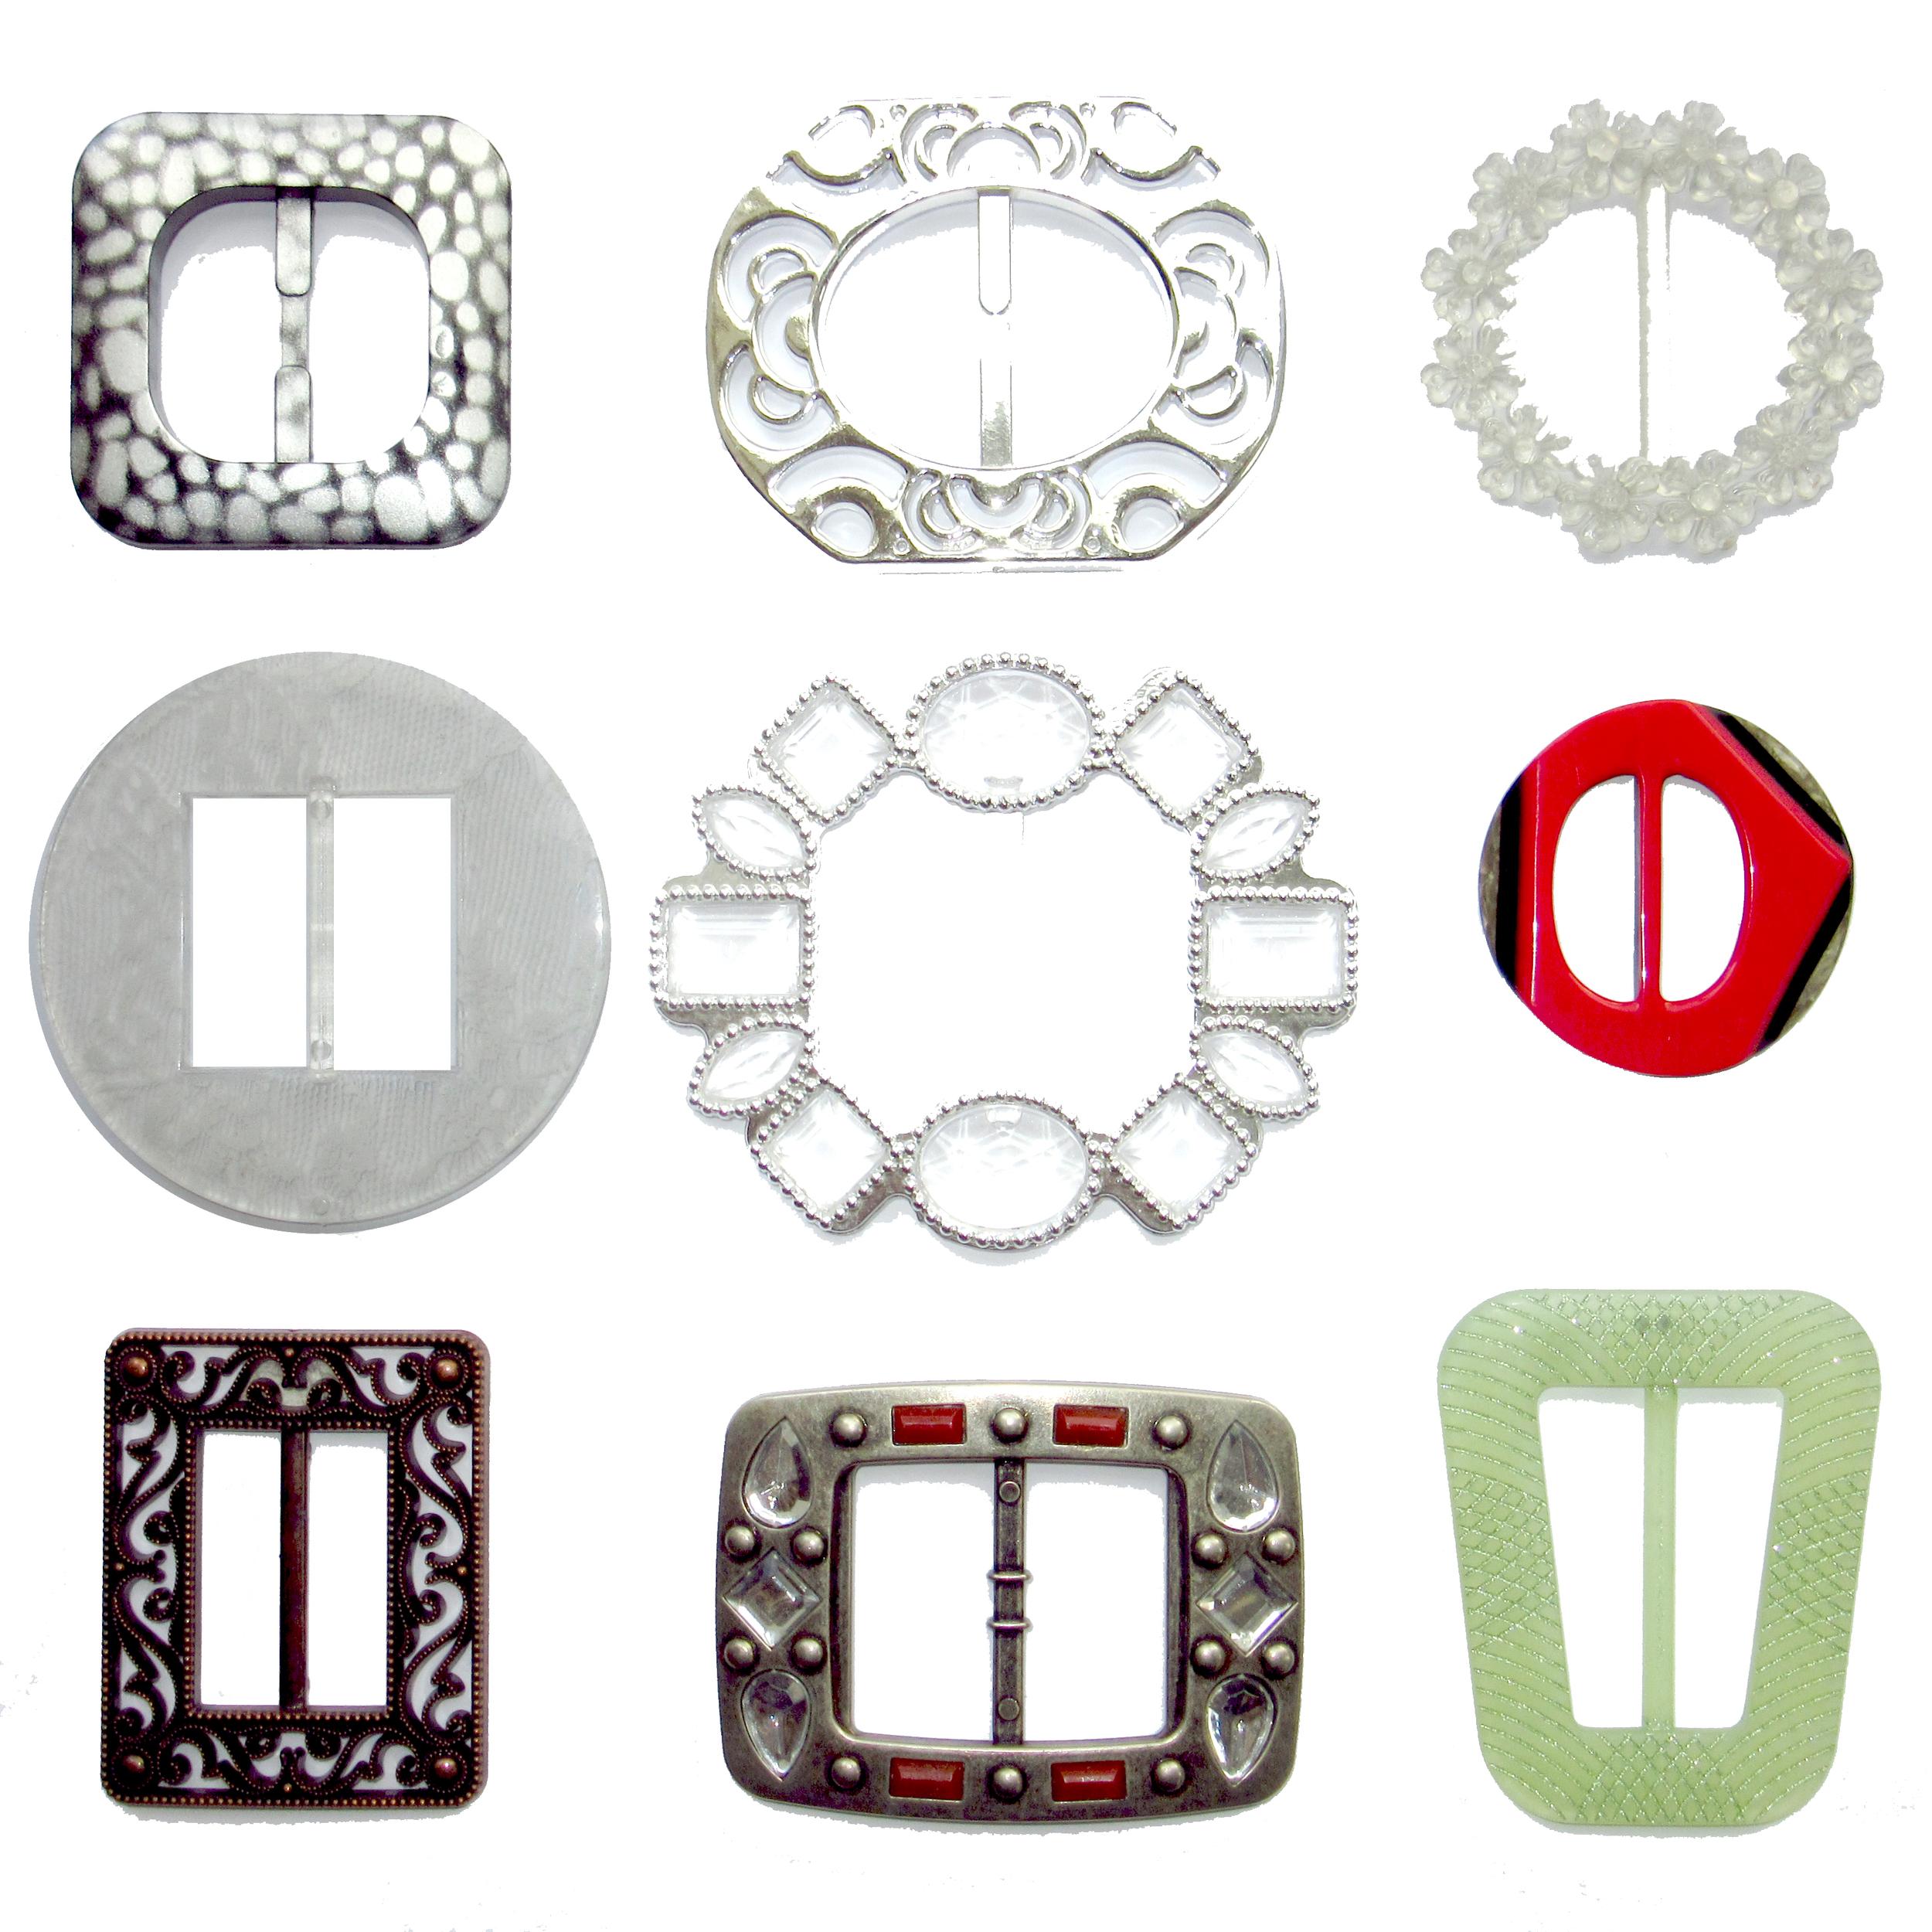 Plastic fantasy belt buckles